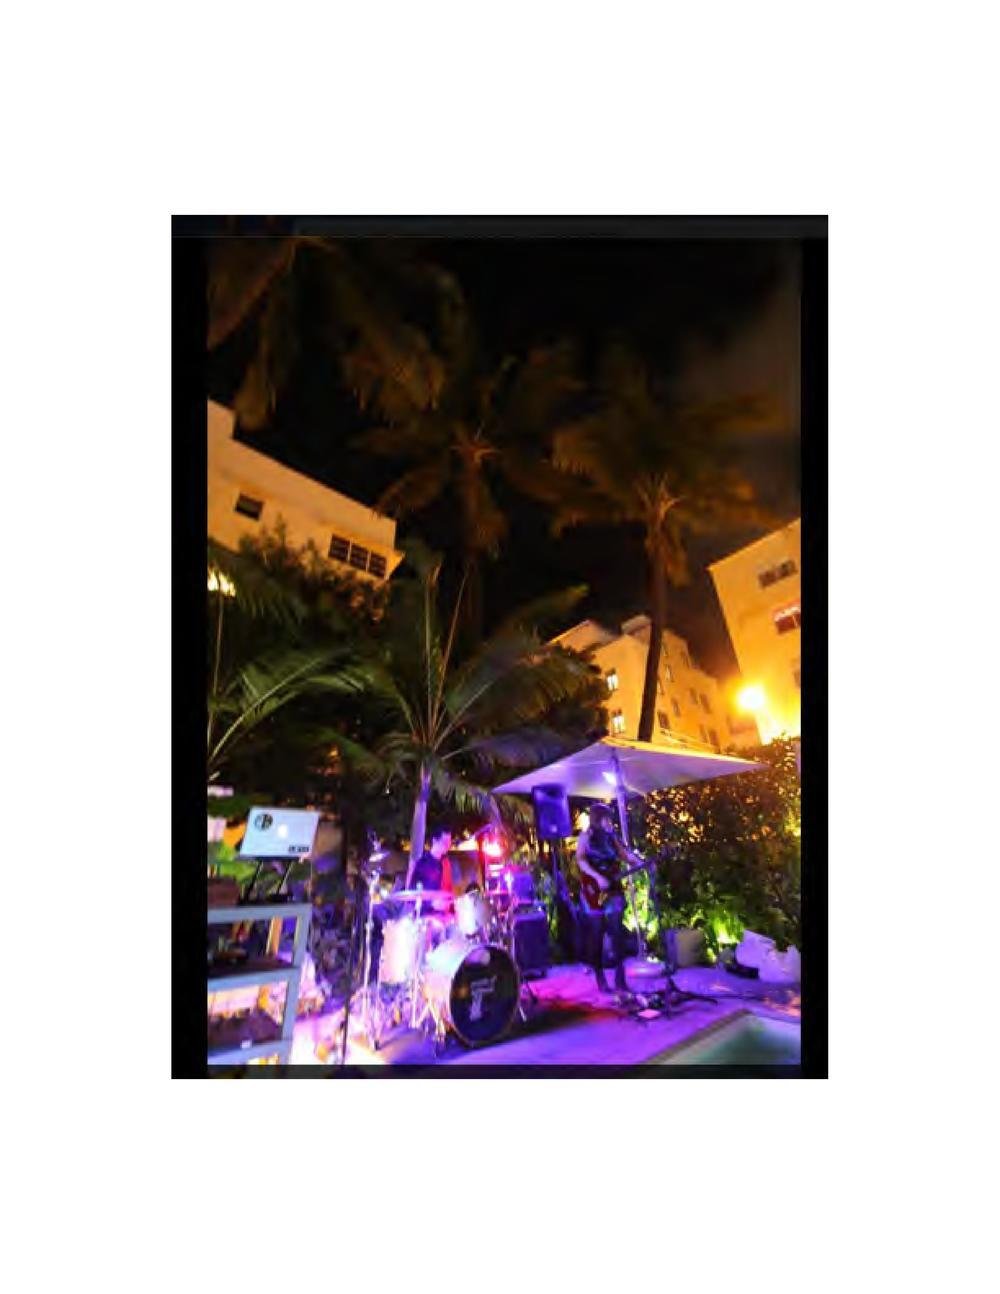 Miami_Art_Basel_Photographs-web-page-074.jpg